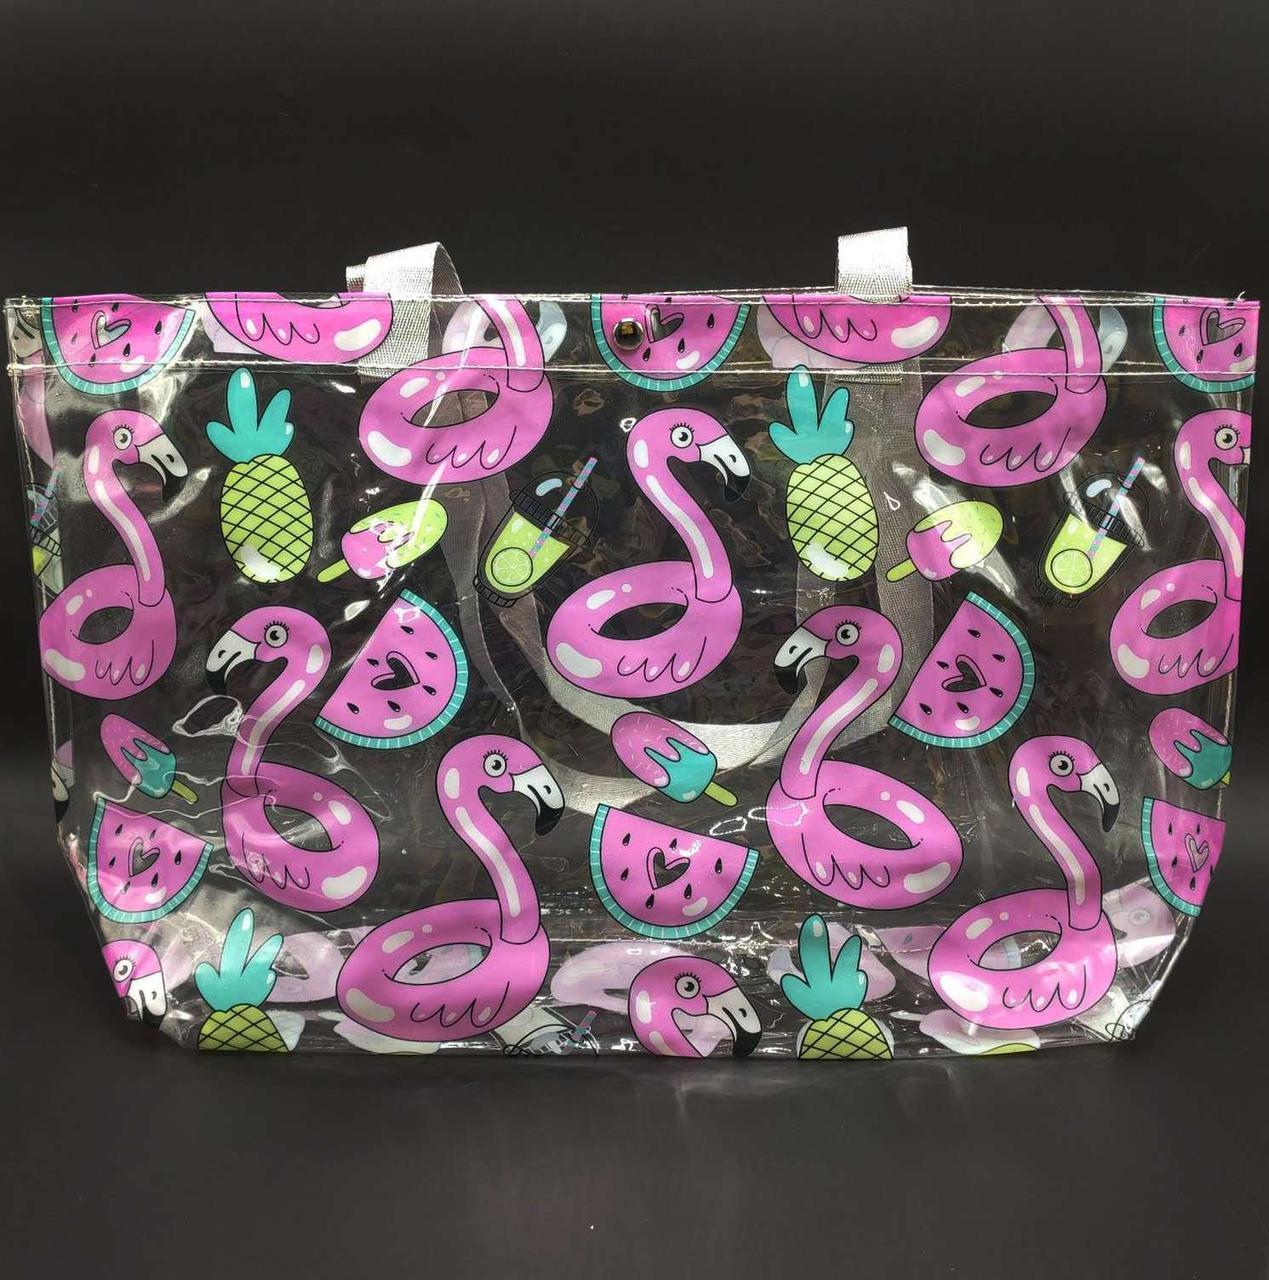 Прозора стильна сумка - фламінго